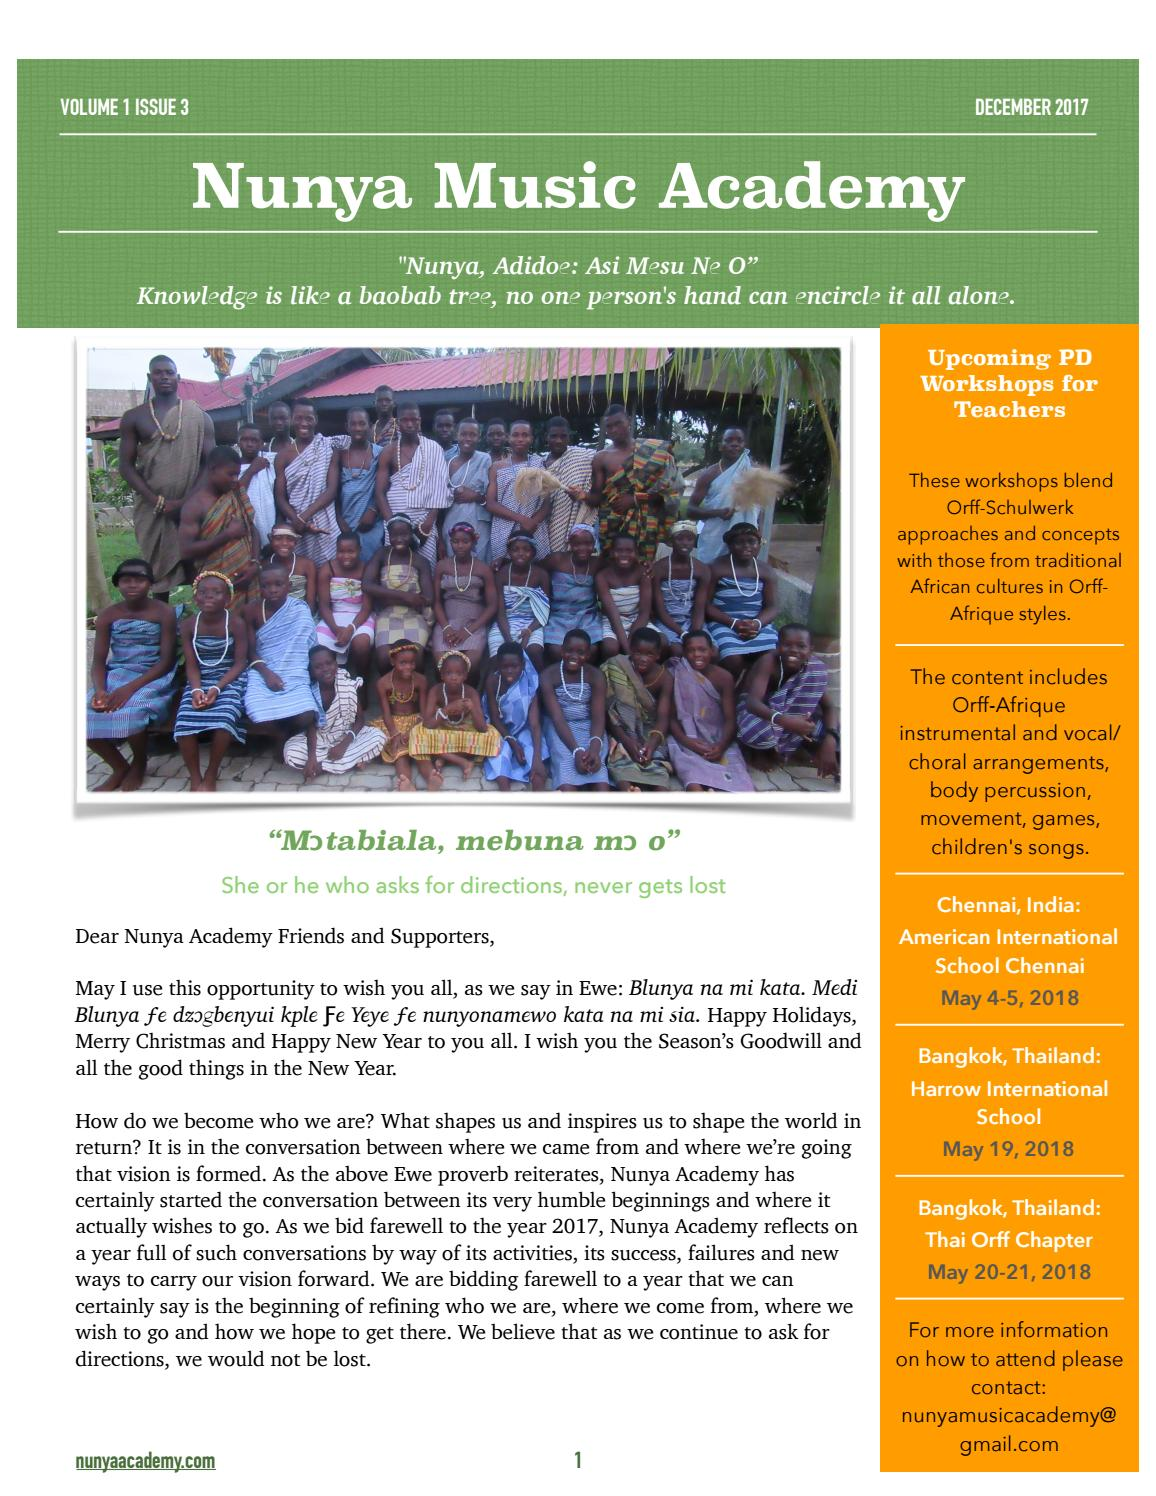 NMA Newsletter Vol 1 Issue 3 by Nunya Music Academy - issuu